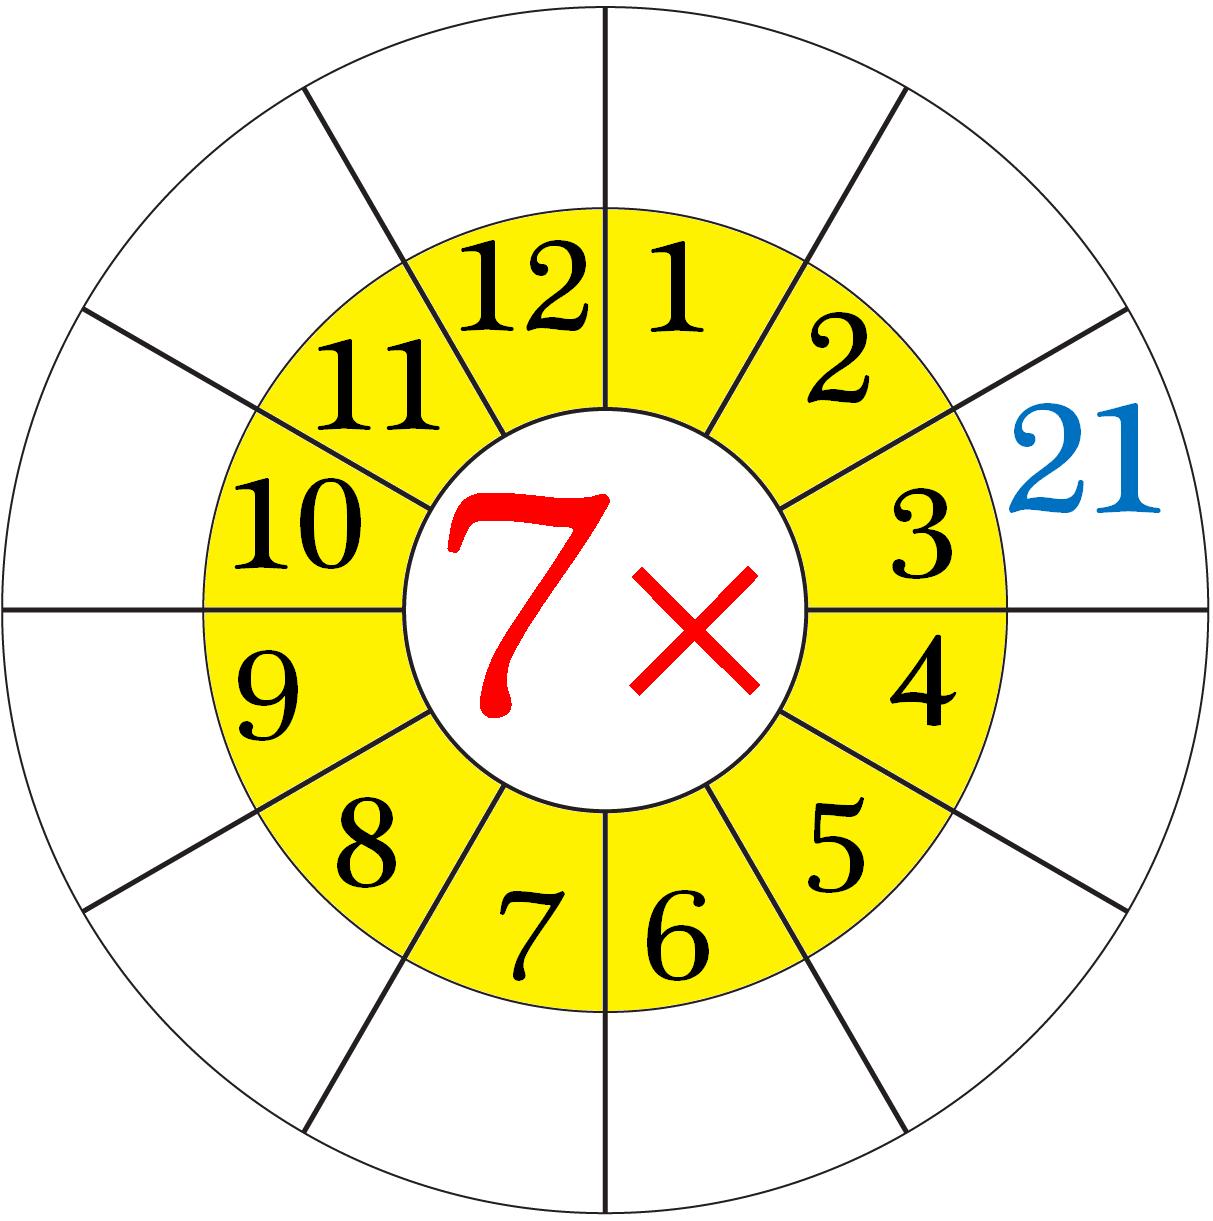 Multiplication Worksheets 7 Times Tables The Best Worksheets Image